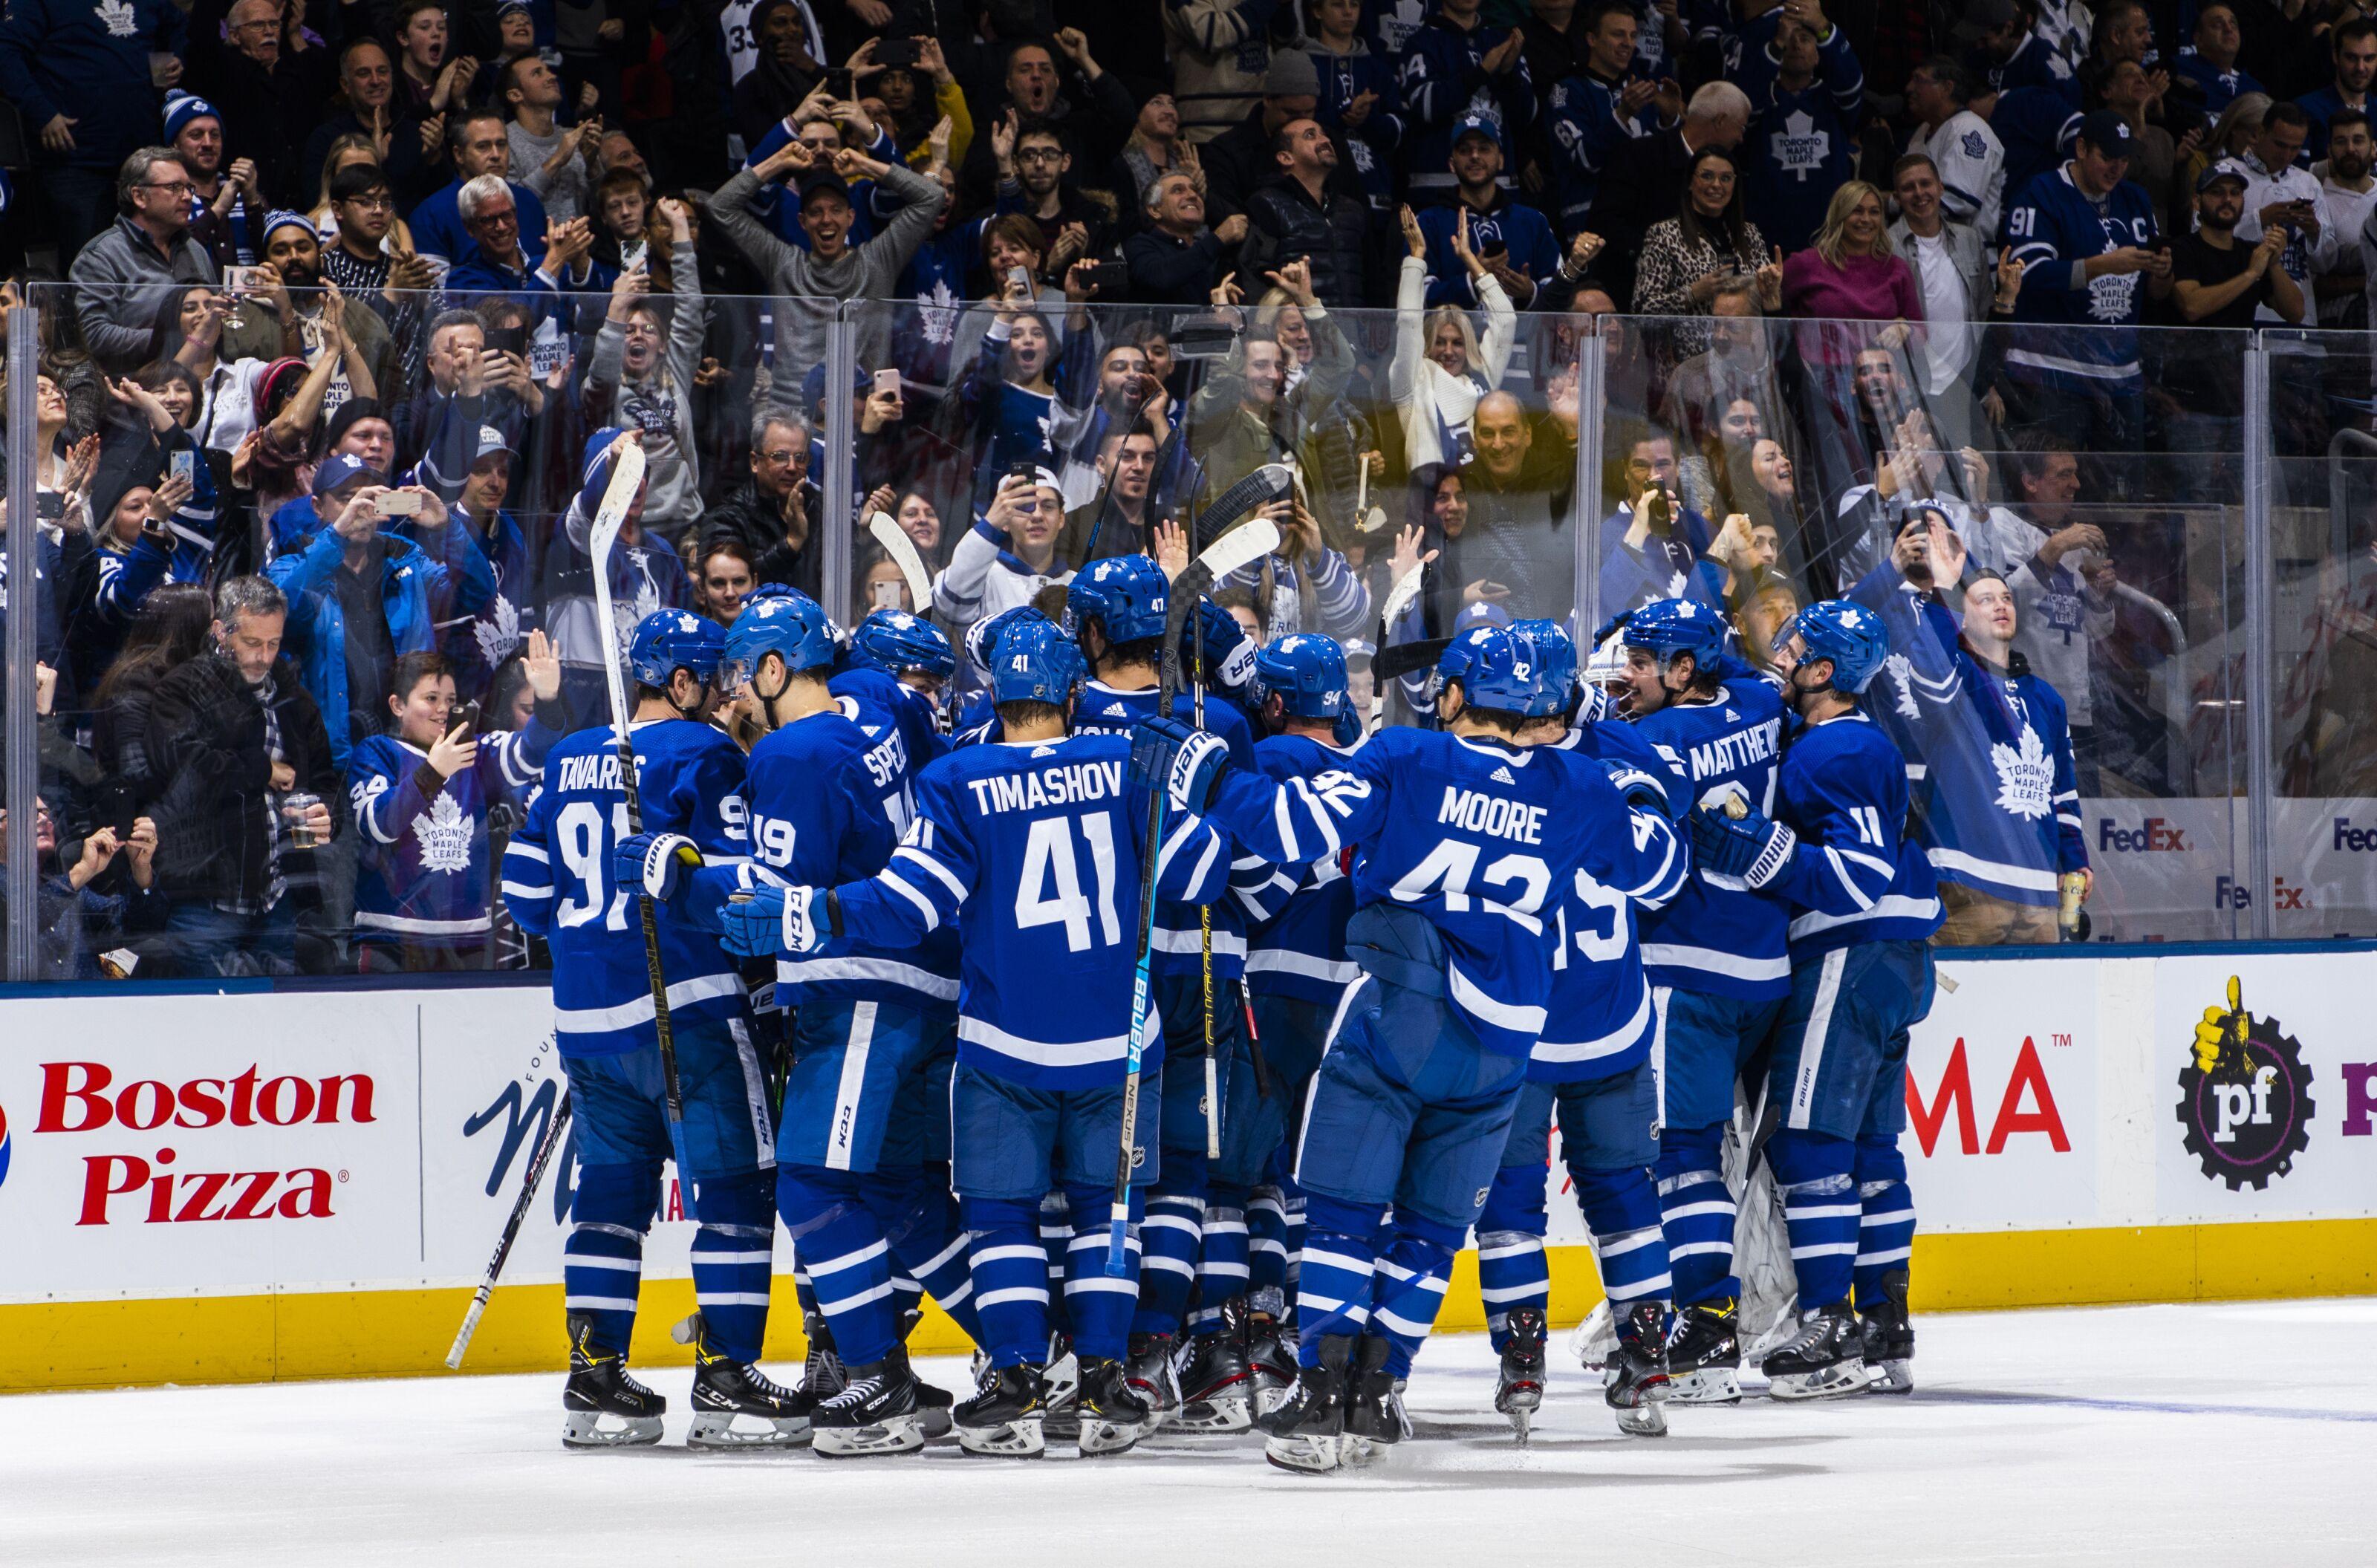 Toronto Maple Leafs Should Orchestrate Blockbuster Trade For Josh Manson